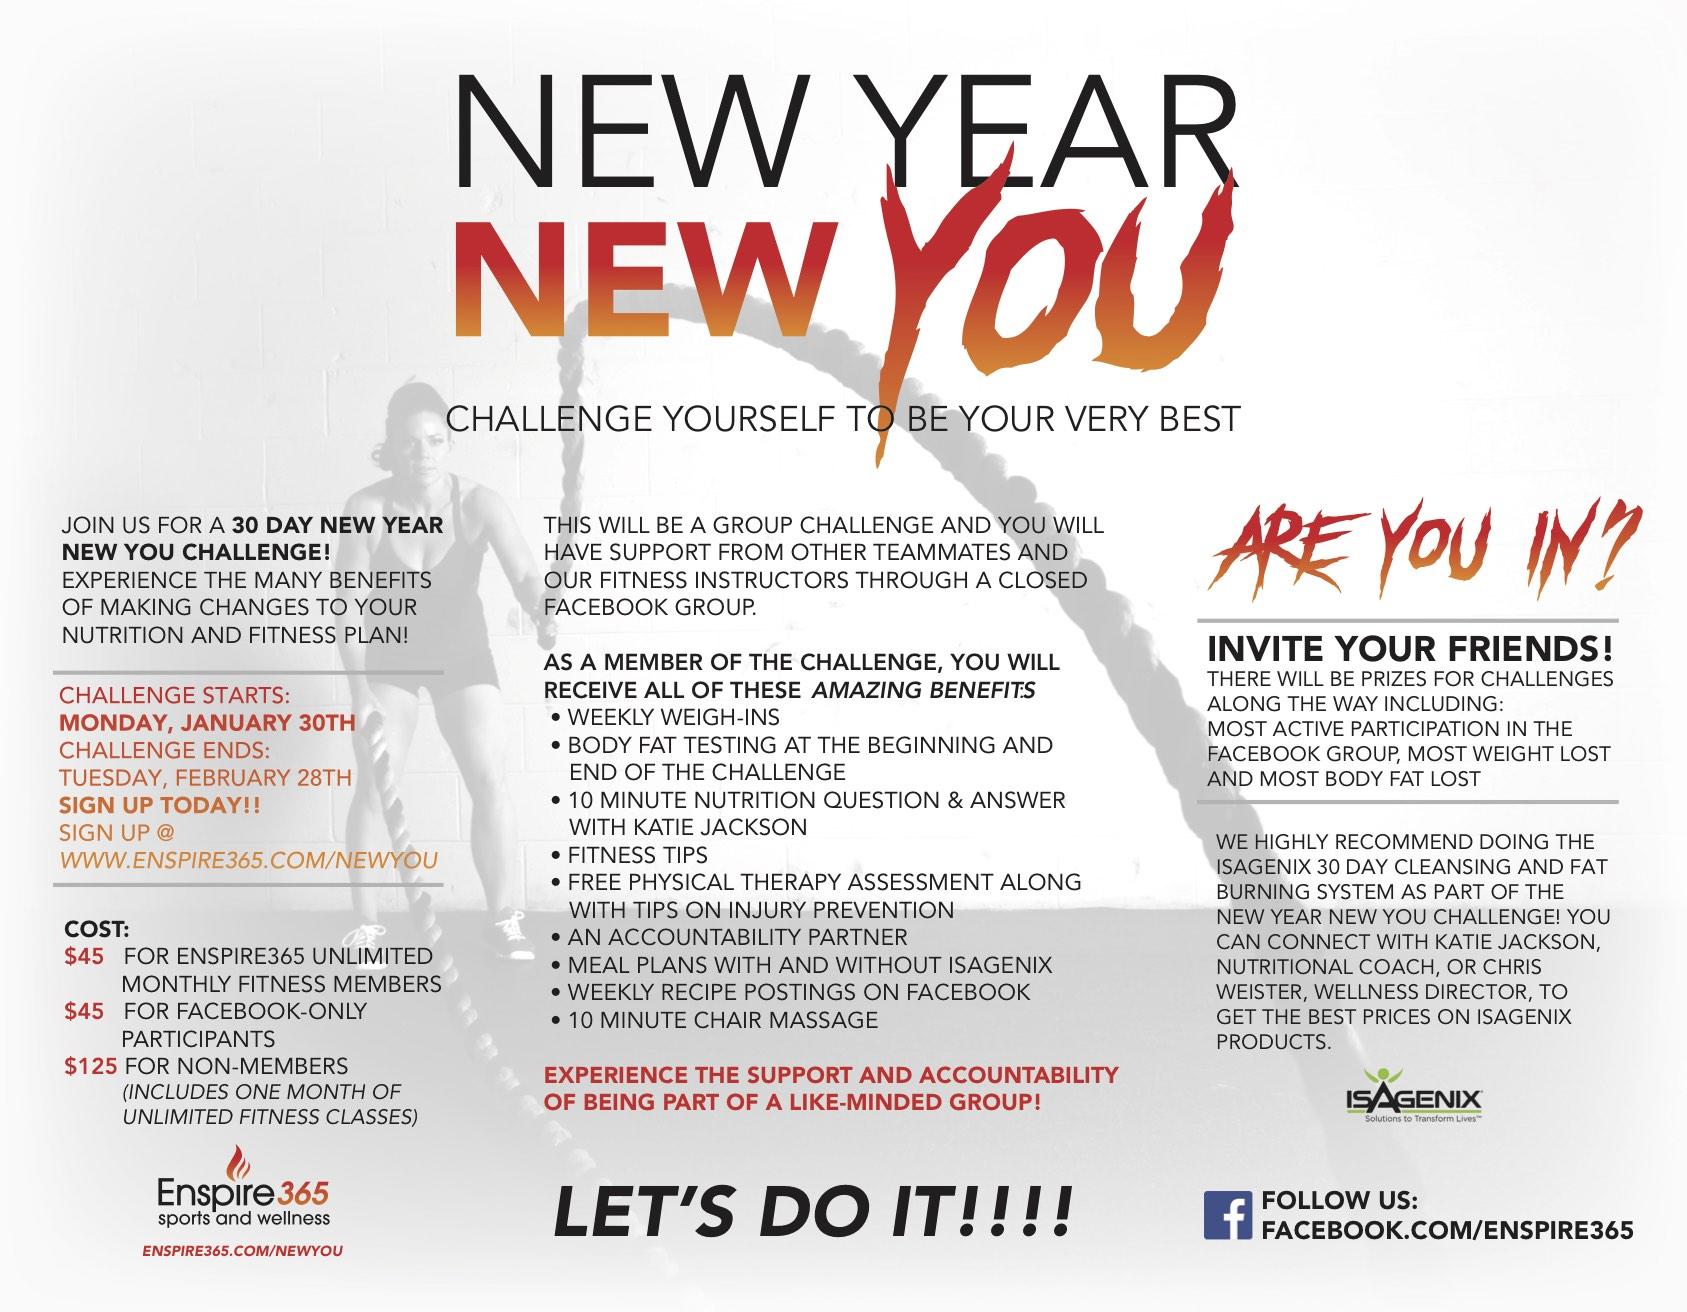 New Year New You Wellness Challenge – Blaze365